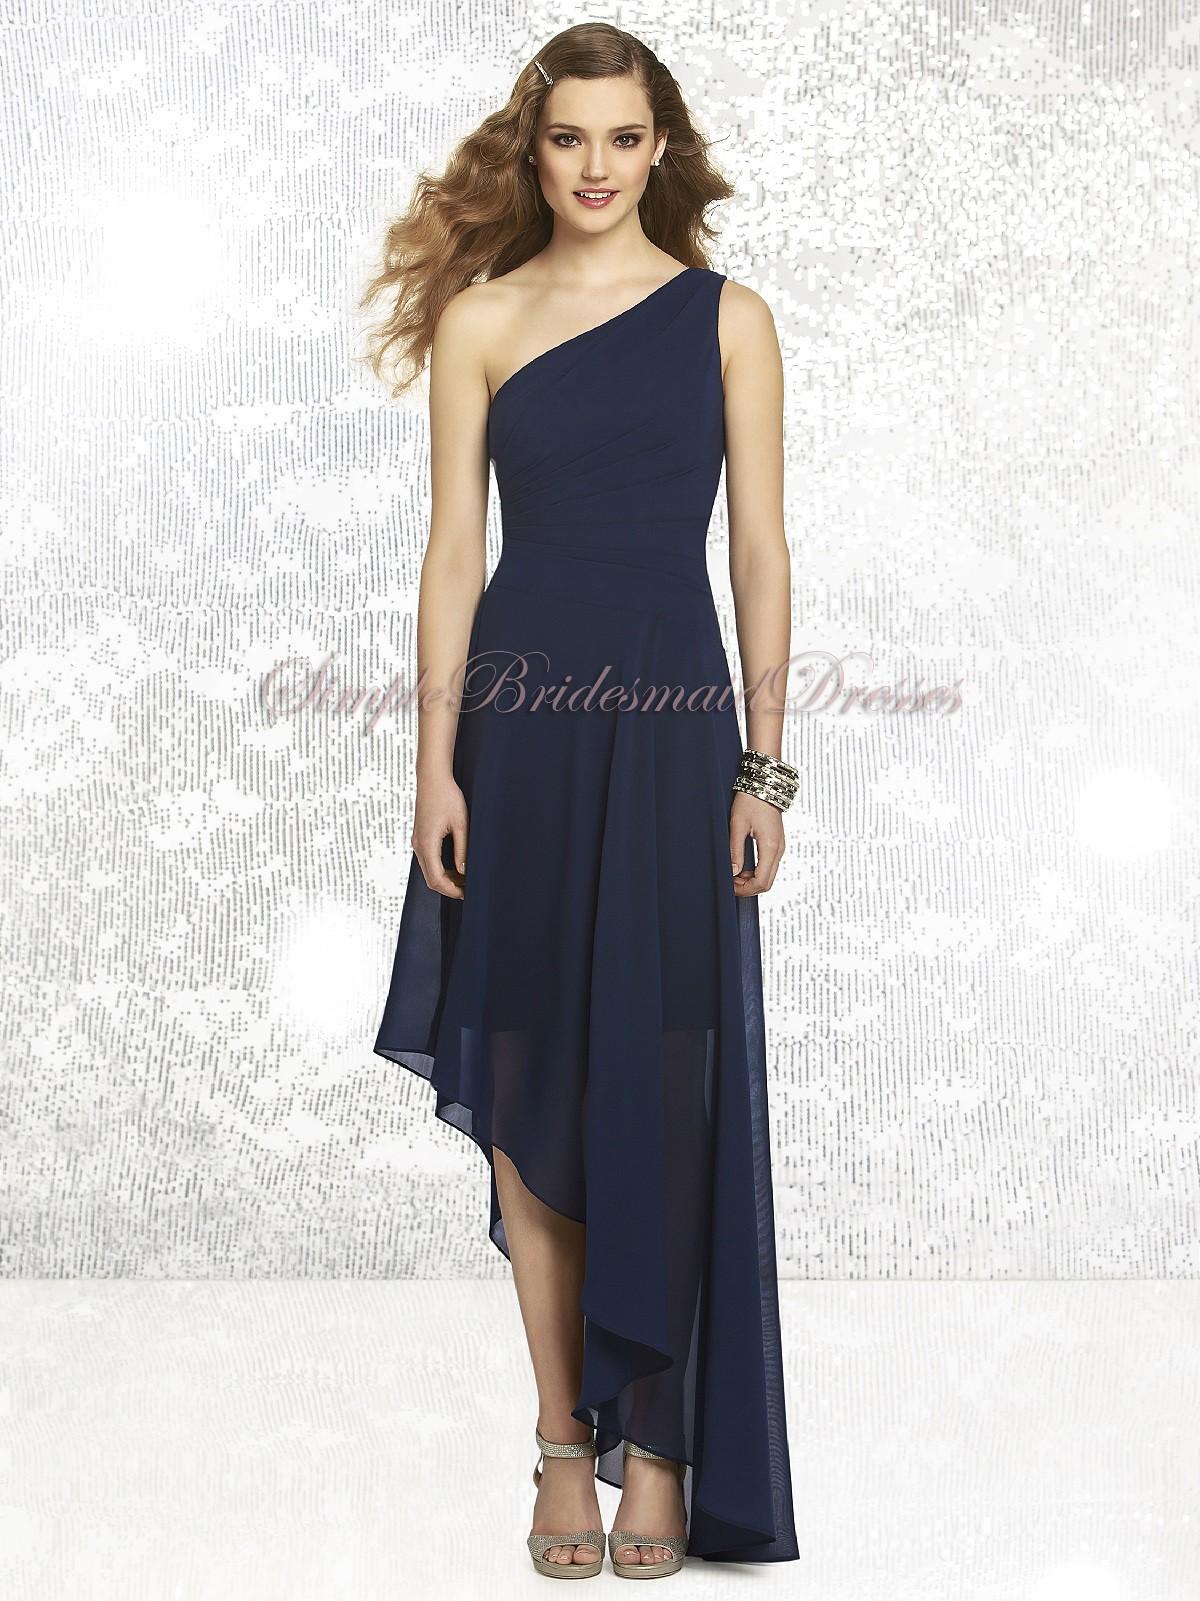 8b704a4f95 ... One-Shoulder Chiffon Bridesmaid Dress. Draped Dropped A-line midnight  Sleeveless Dark-Navy Floor-length Zipper One- ...